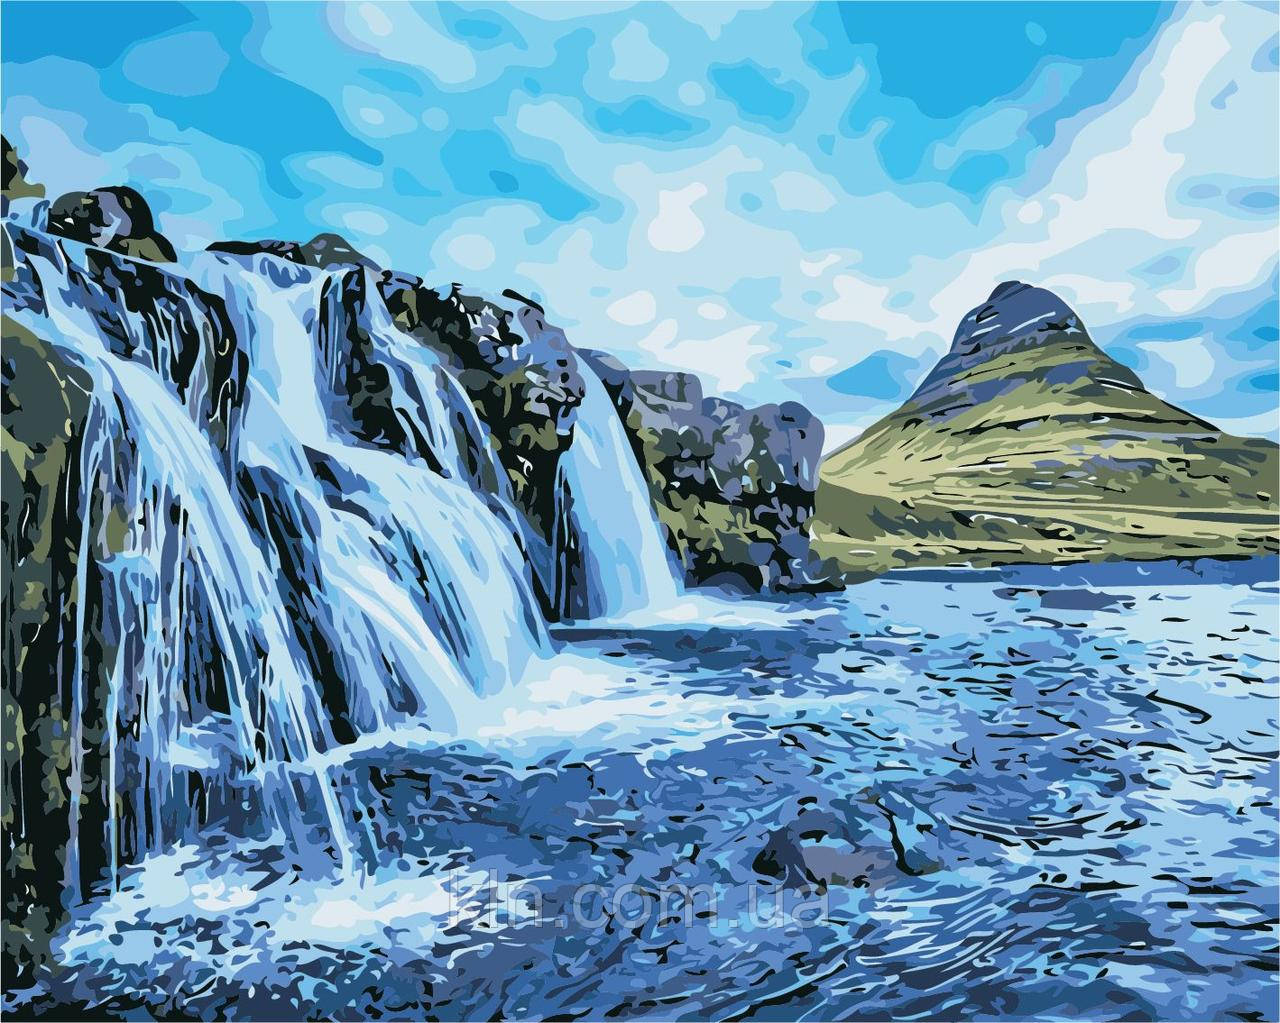 Картина по номерам ArtStory Водопады 40 х 50 см (арт. AS0387)